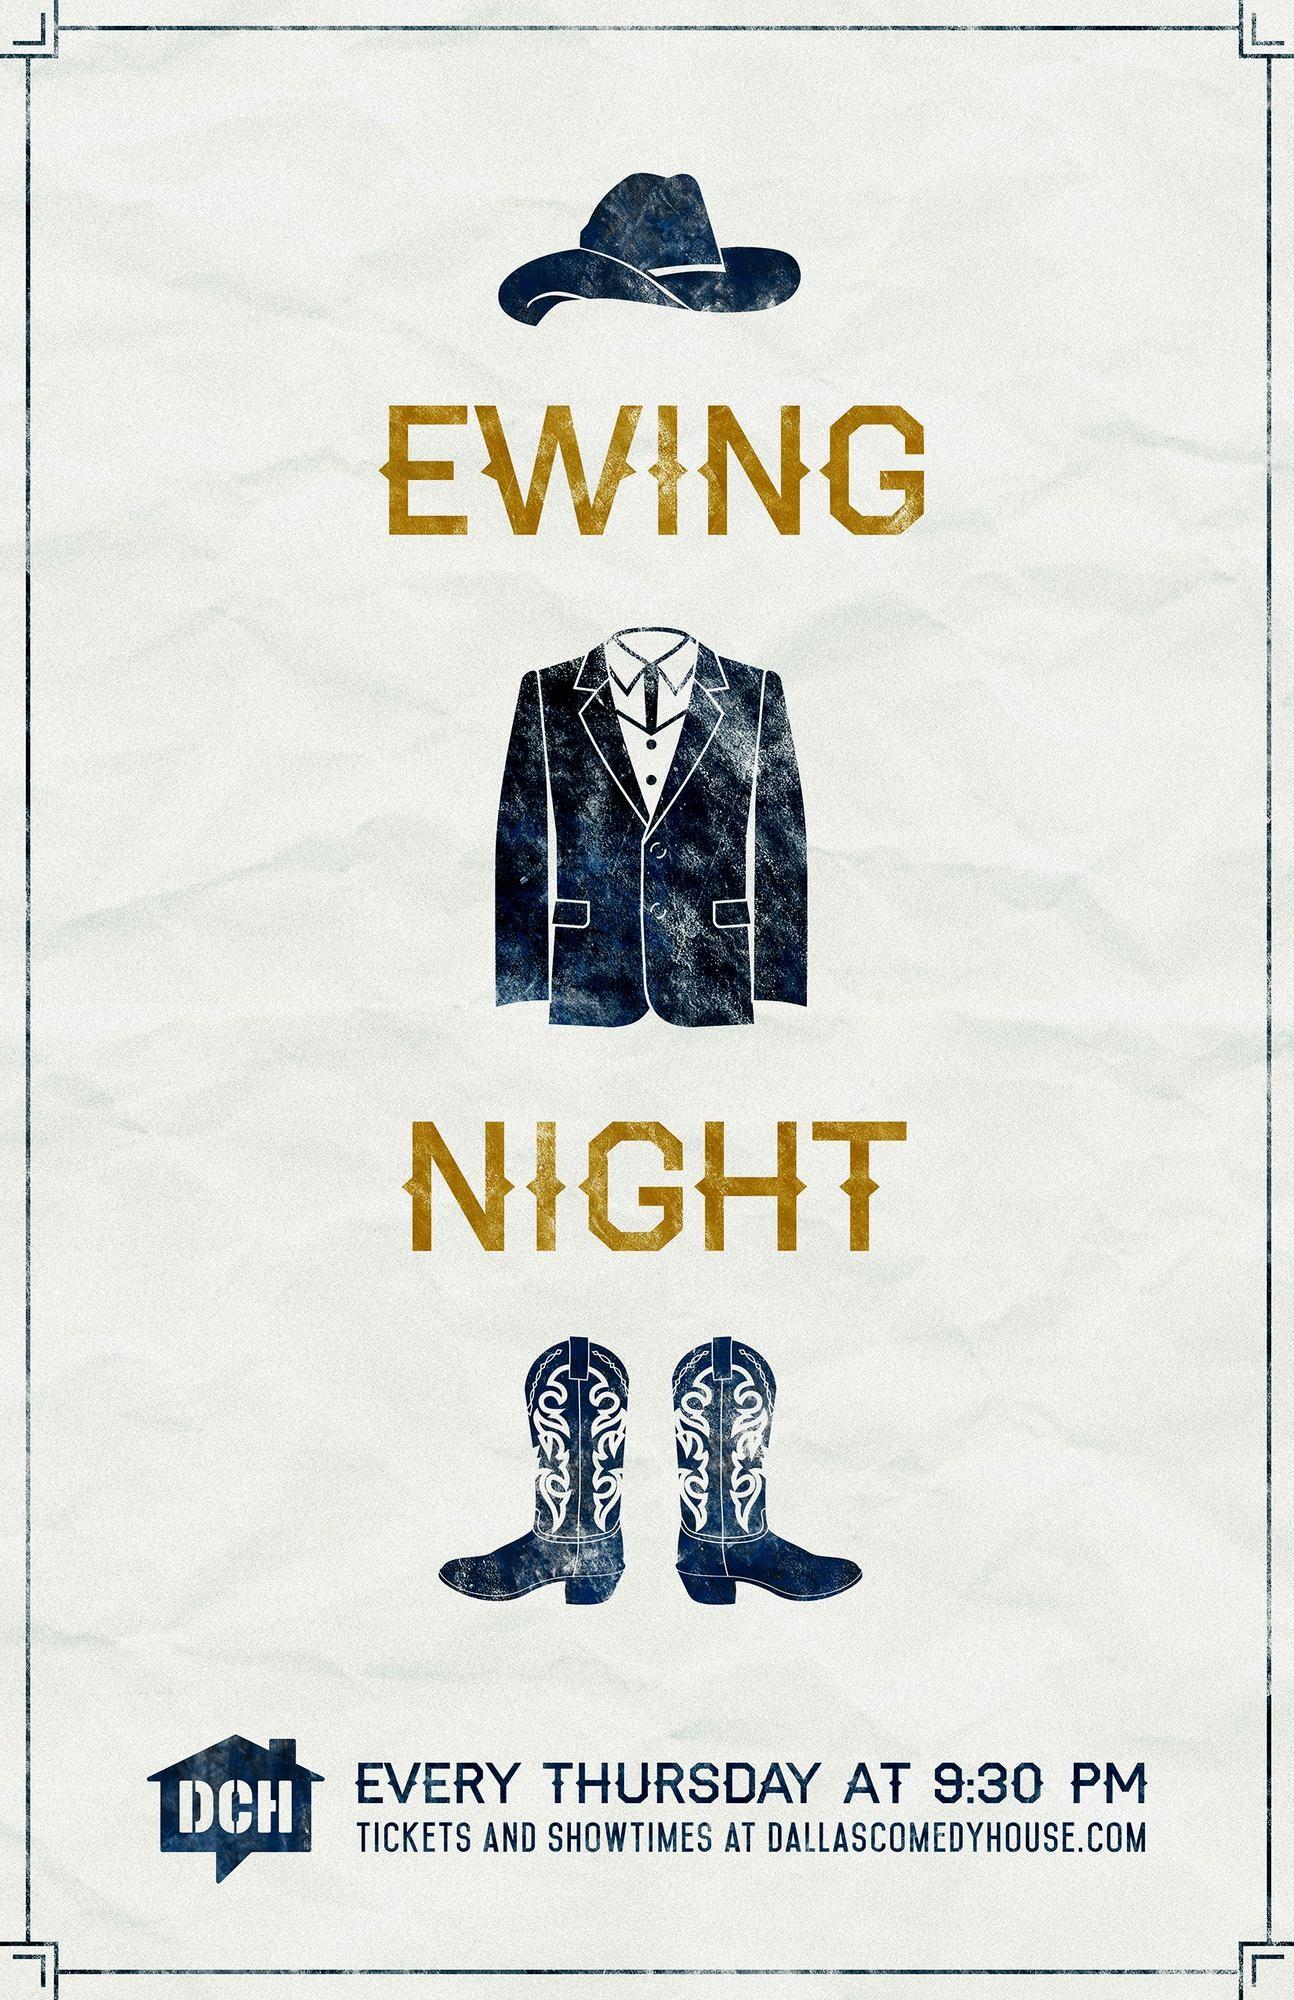 ewing base.jpg